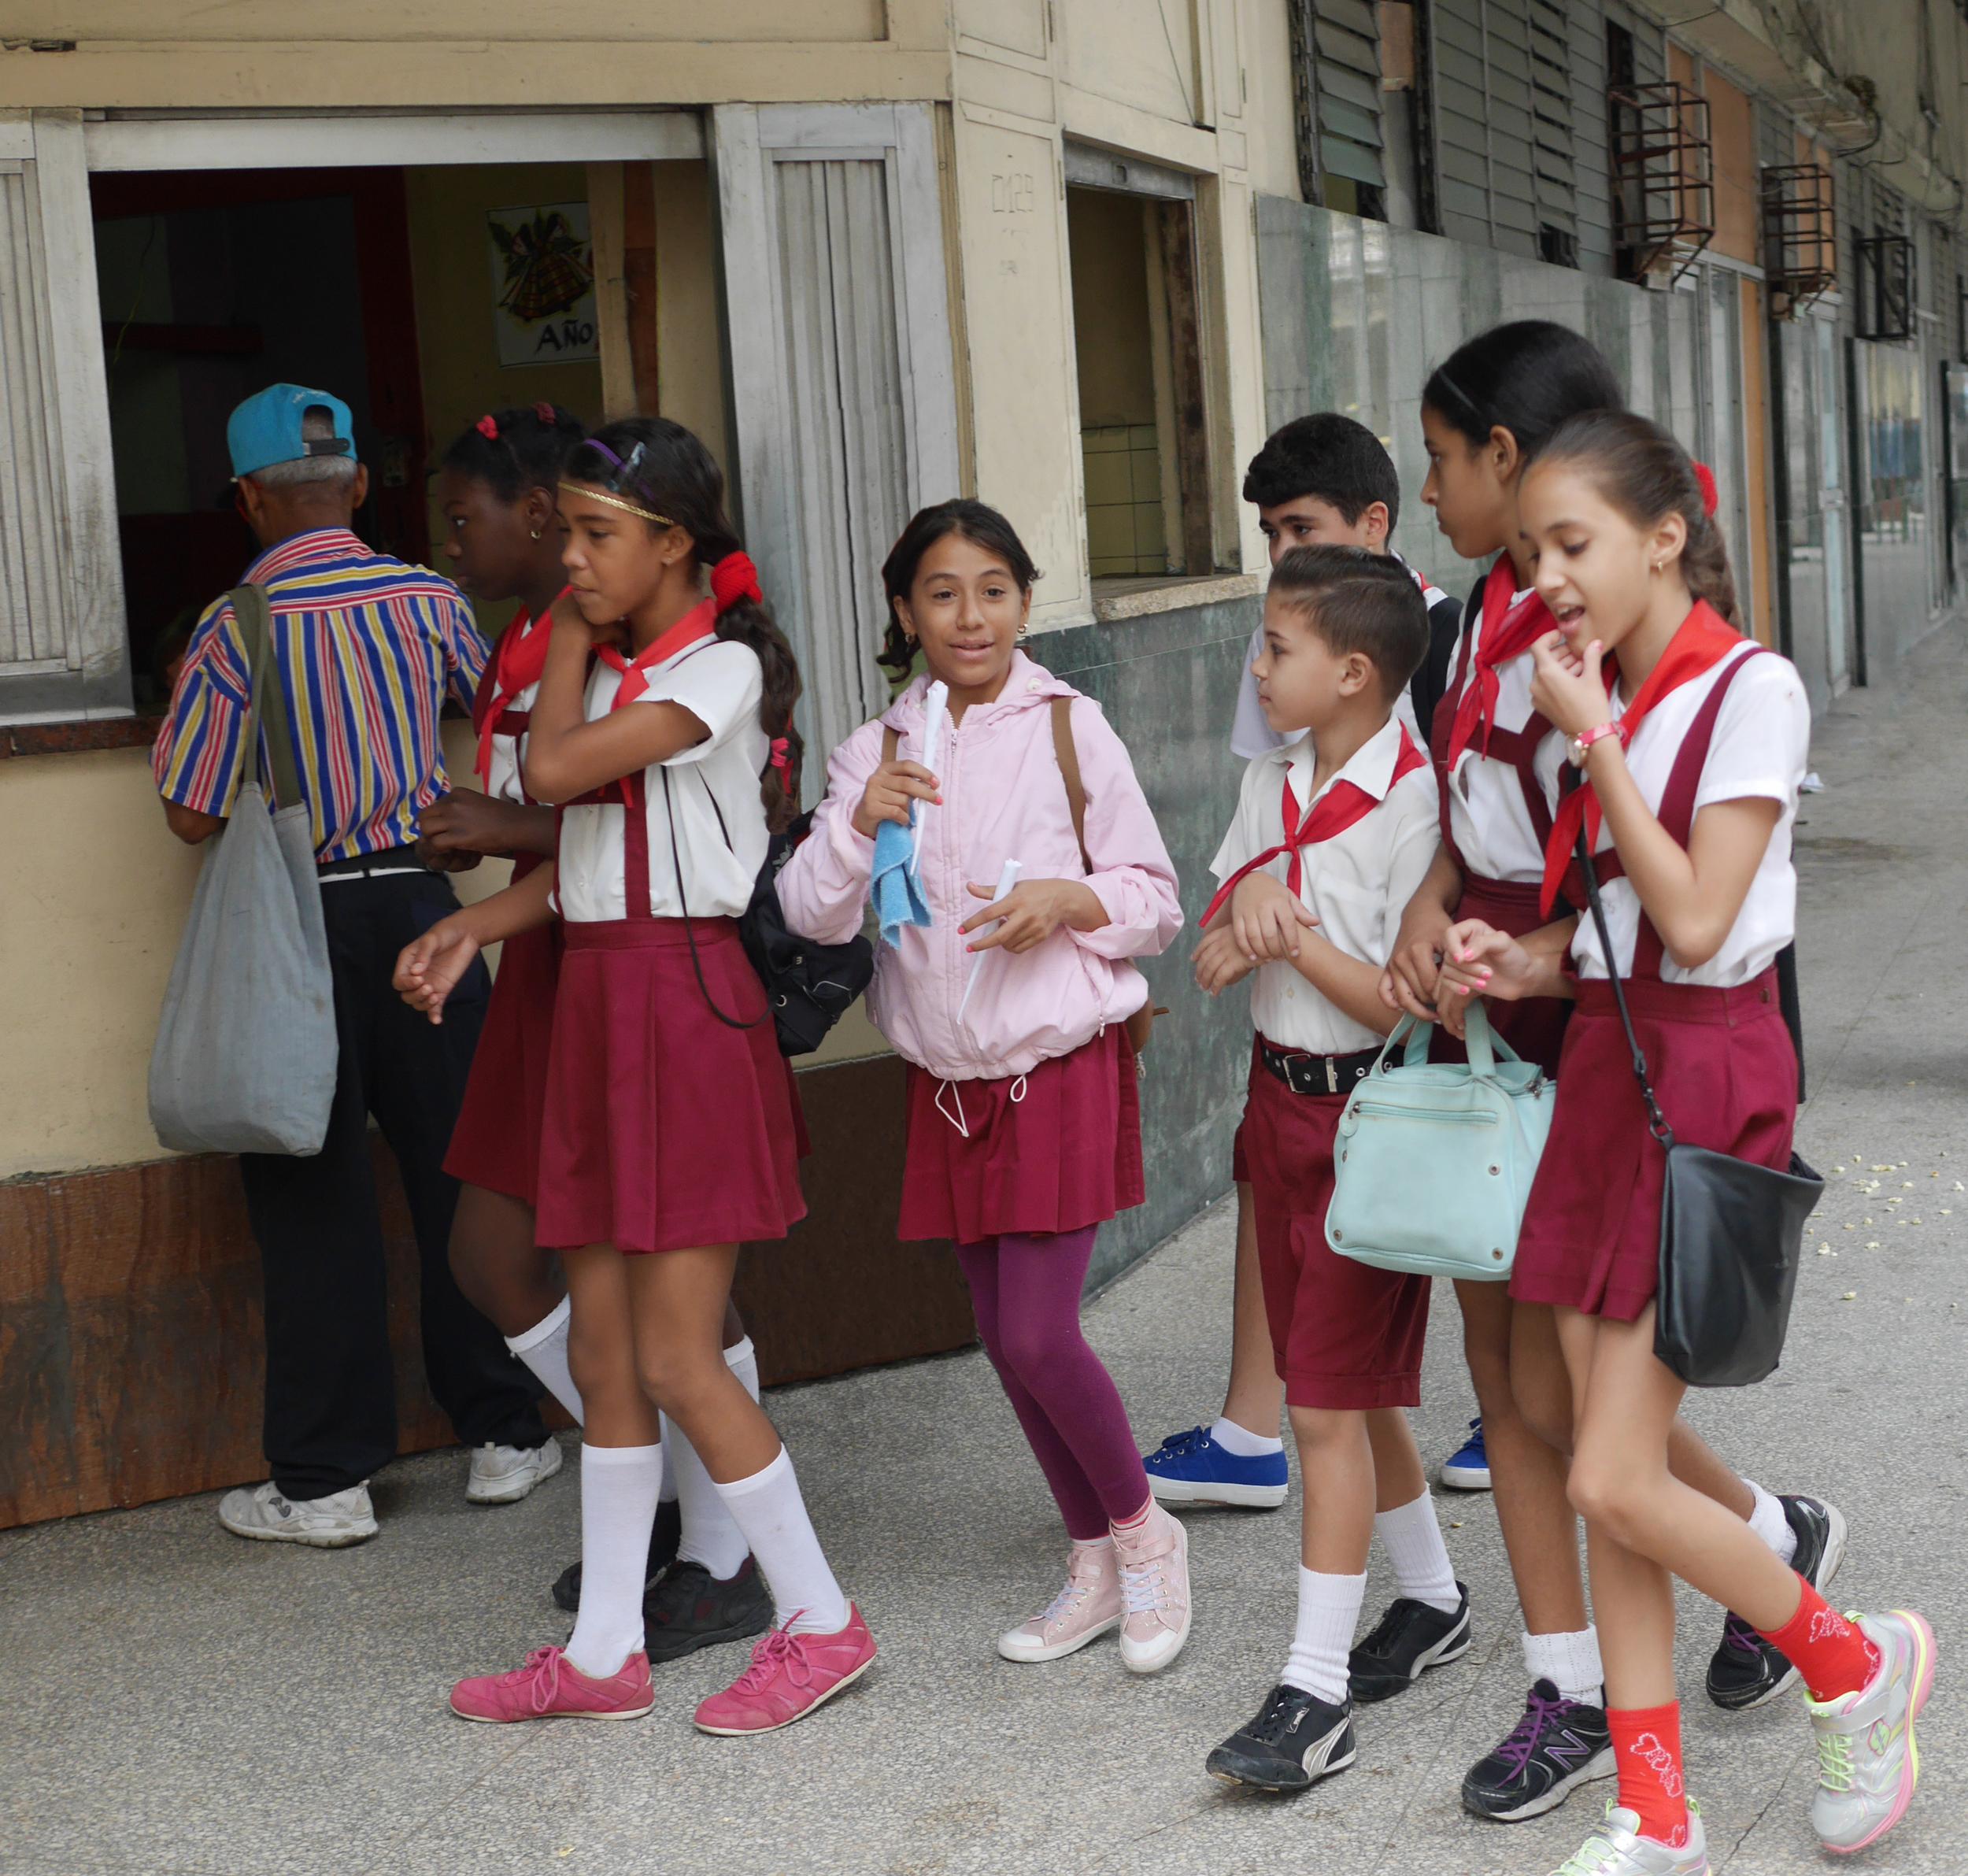 School kids heading home